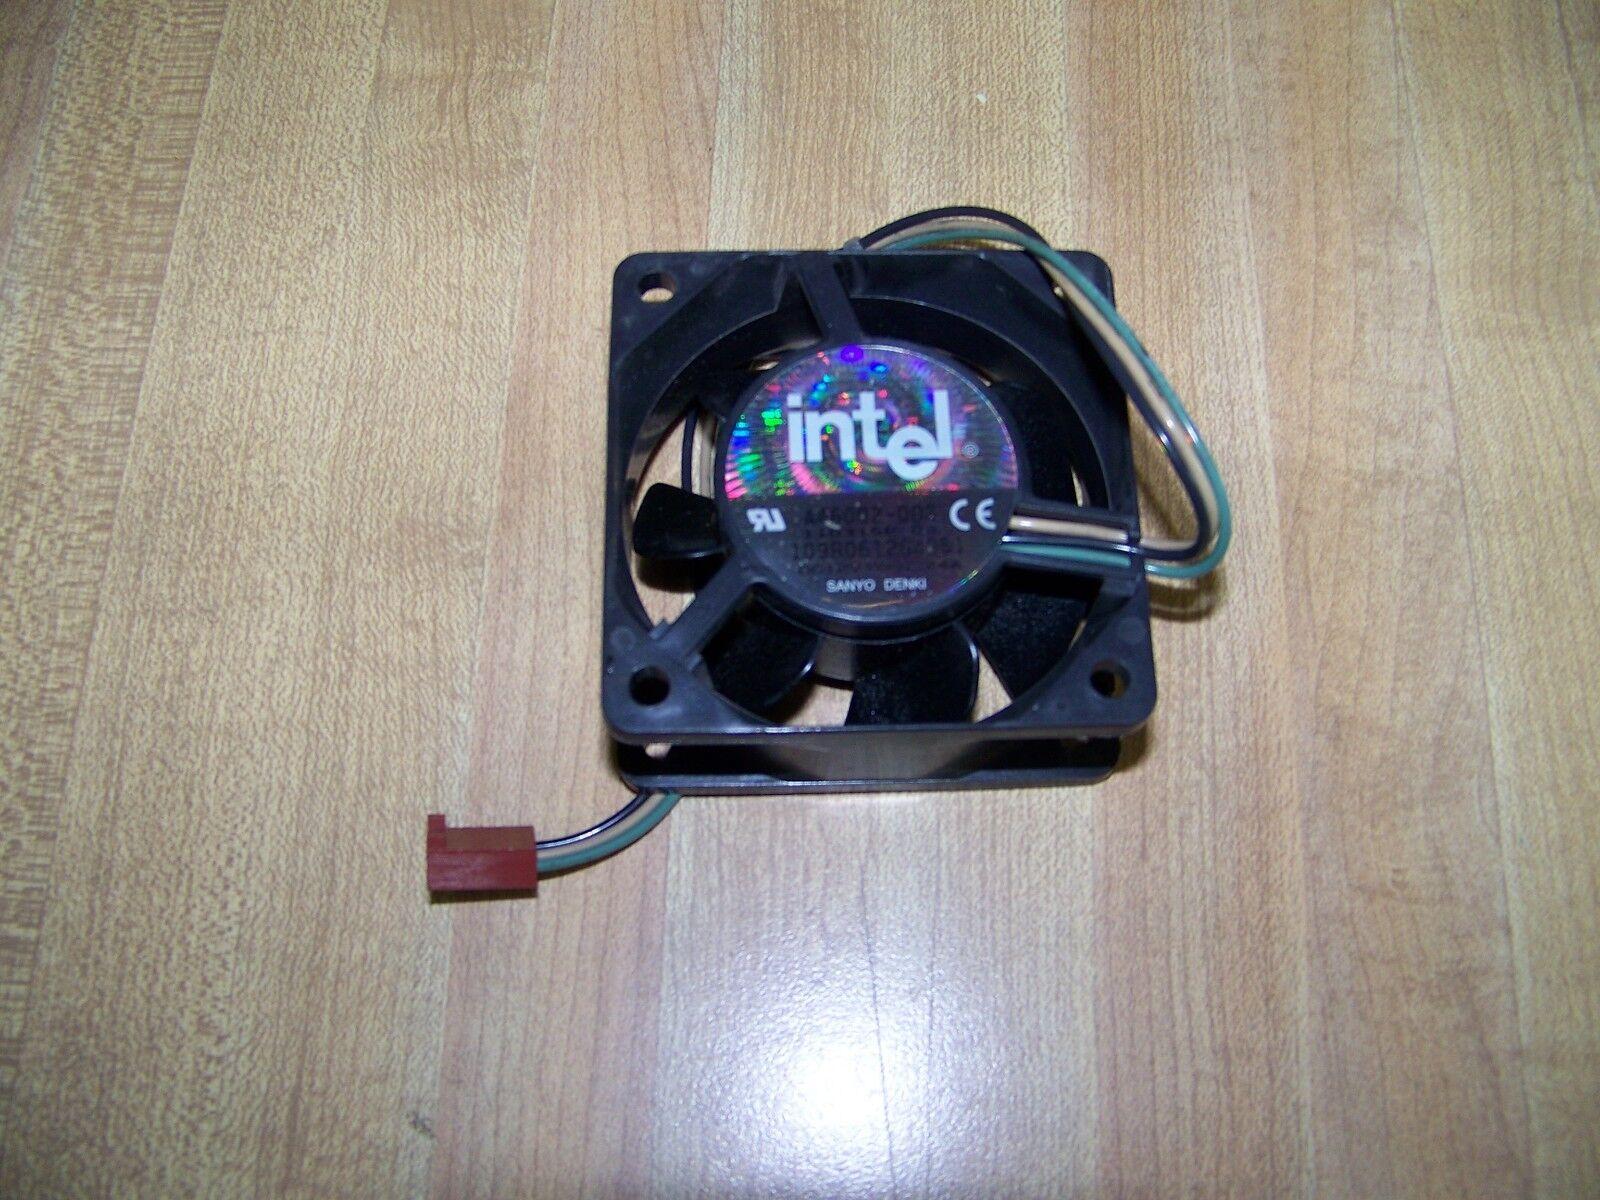 (Lot of 2) Intel A46002-003 Cooling Fans DC12V O.24A Sanyo Denki